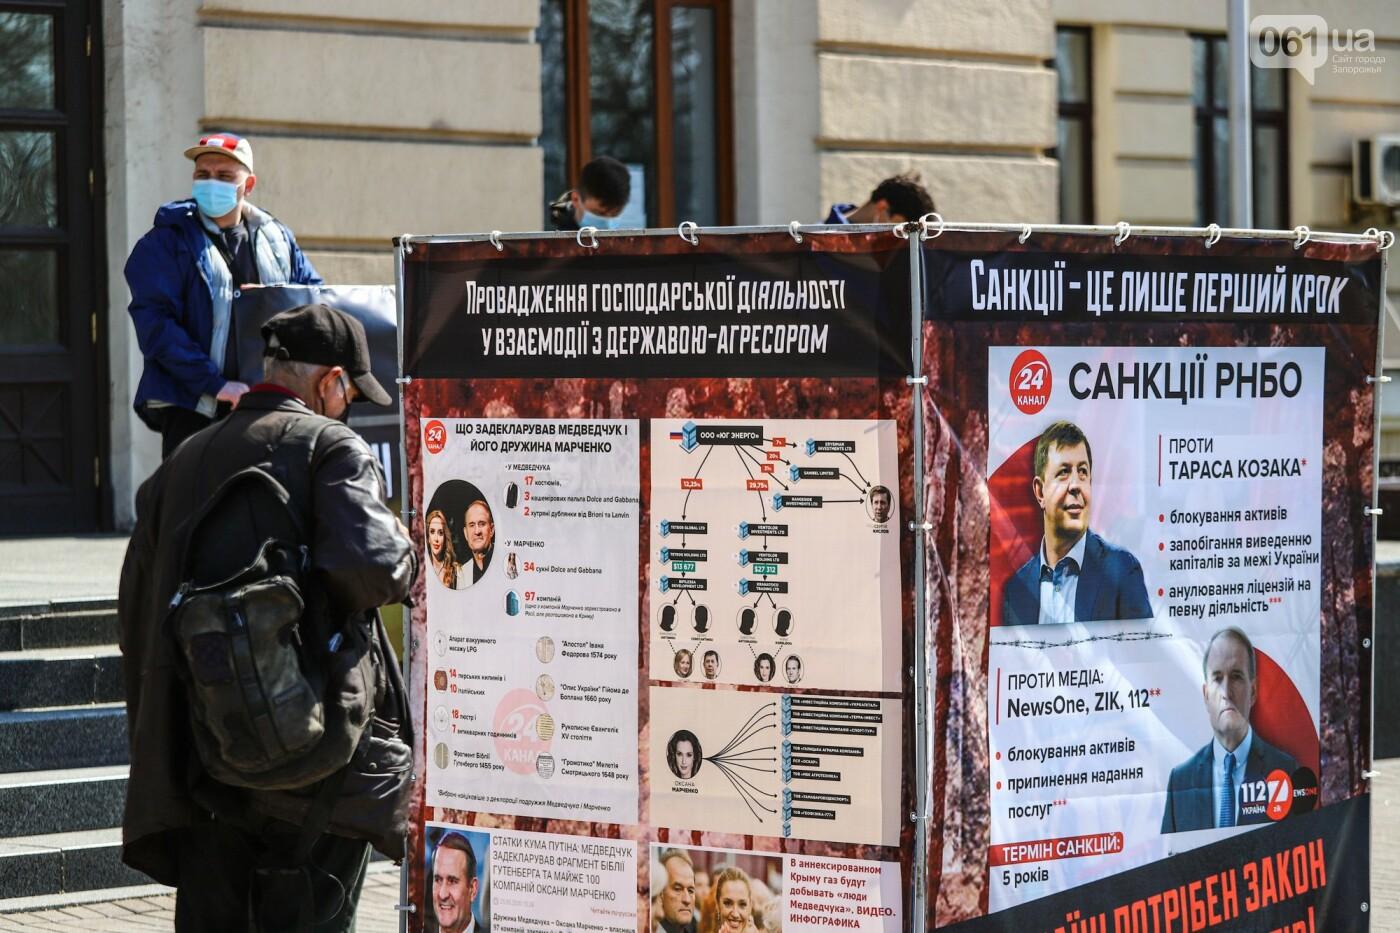 В Запорожье возле мэрии установили стенды с портретами Медведчука и Шария, - ФОТО, фото-10